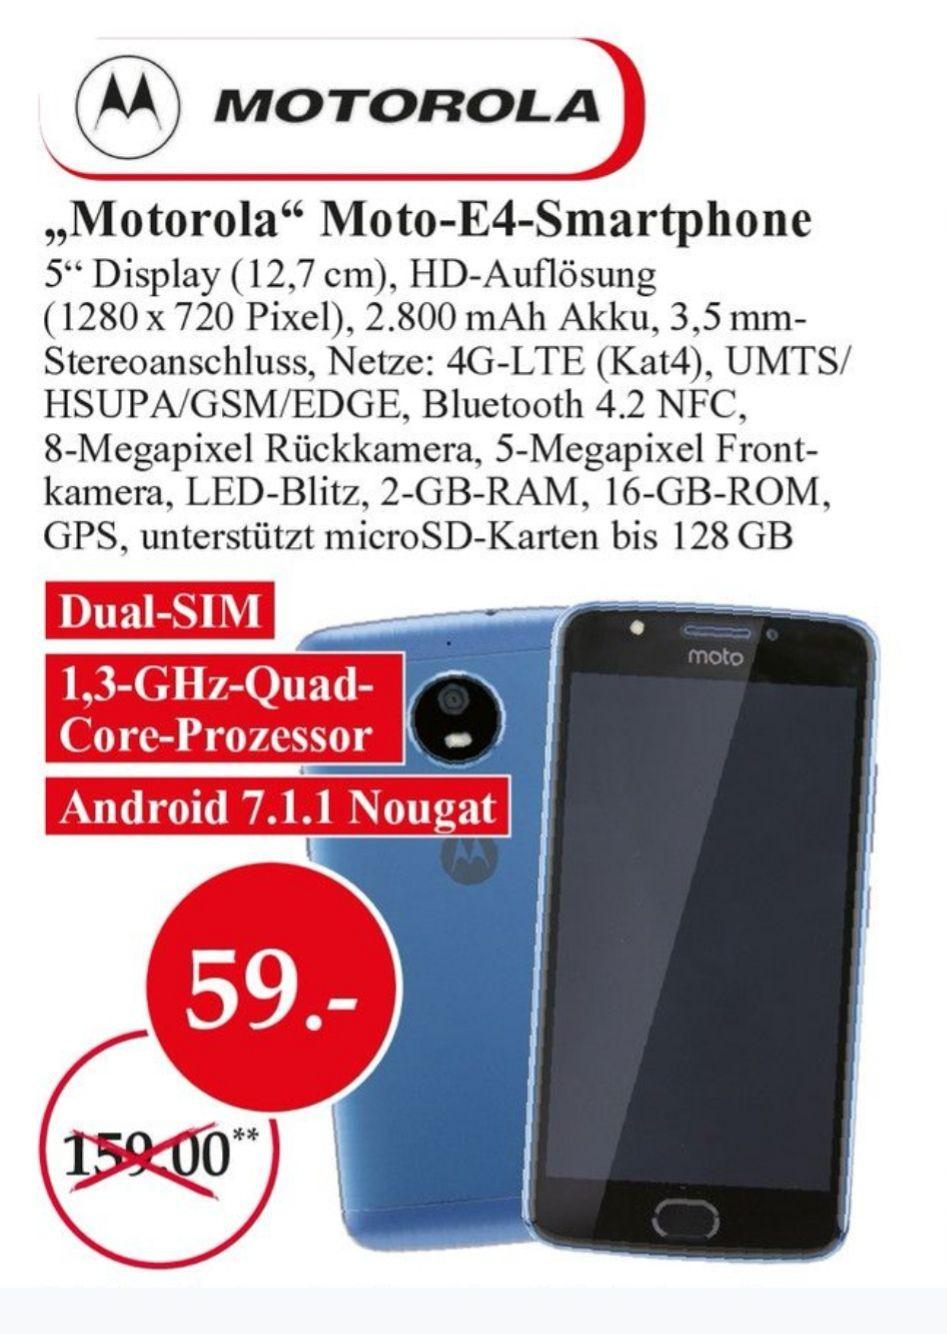 [Lokal Reutlingen] MOTOROLA MOTO E4 Dual Sim 5 Zoll Smartphone für 59€ *Telefunken D32H278E4 LED-TV 81cm 32 Zoll DVB-T2,HD ready, für 129€